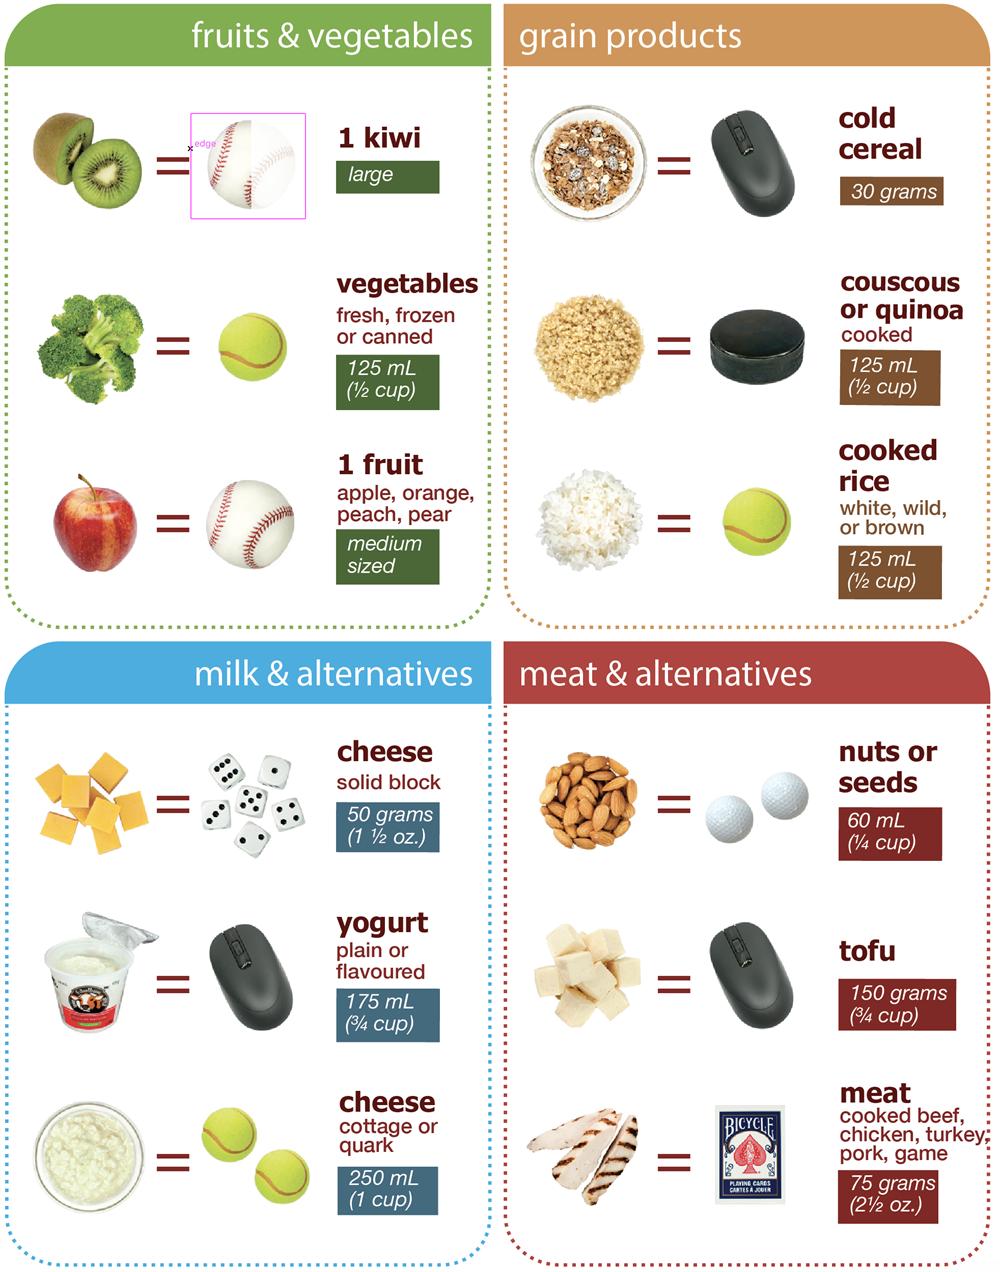 Understanding food product labels